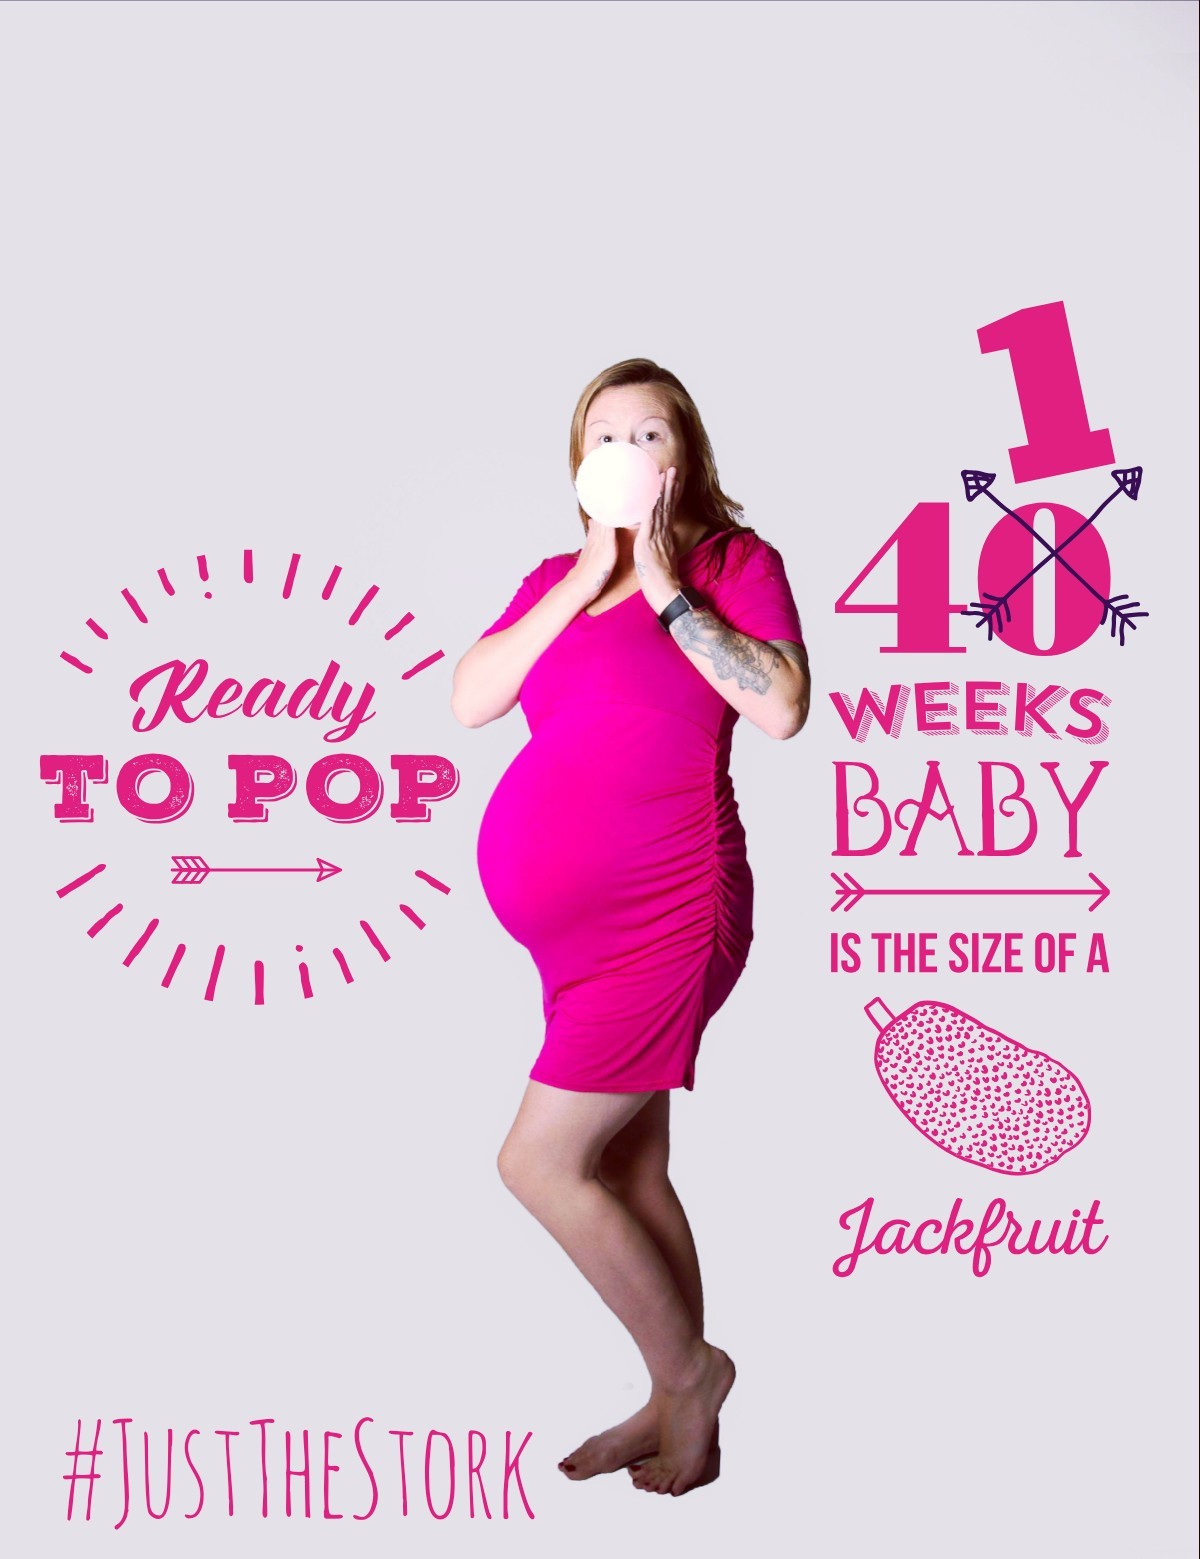 babypics-16-10-2019-0855a.m..jpg